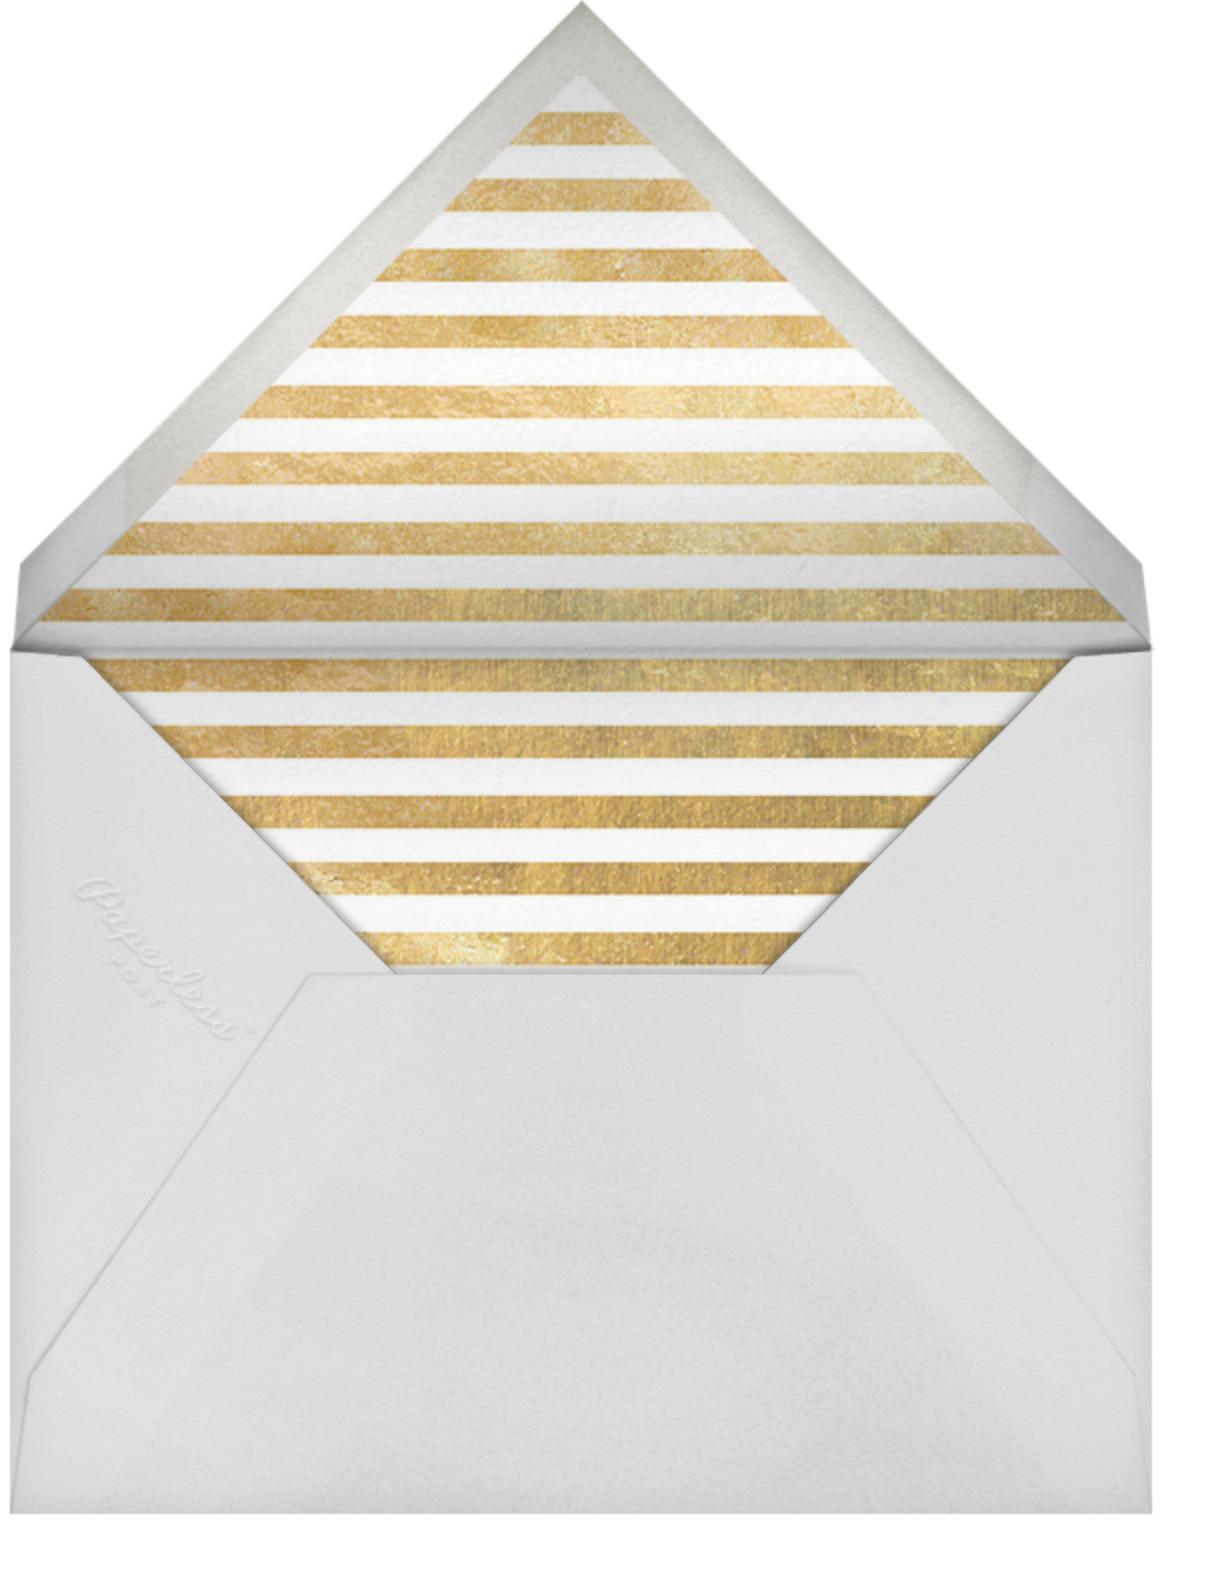 Pop Fizz Clink! (Tall) - kate spade new york - Adult birthday - envelope back